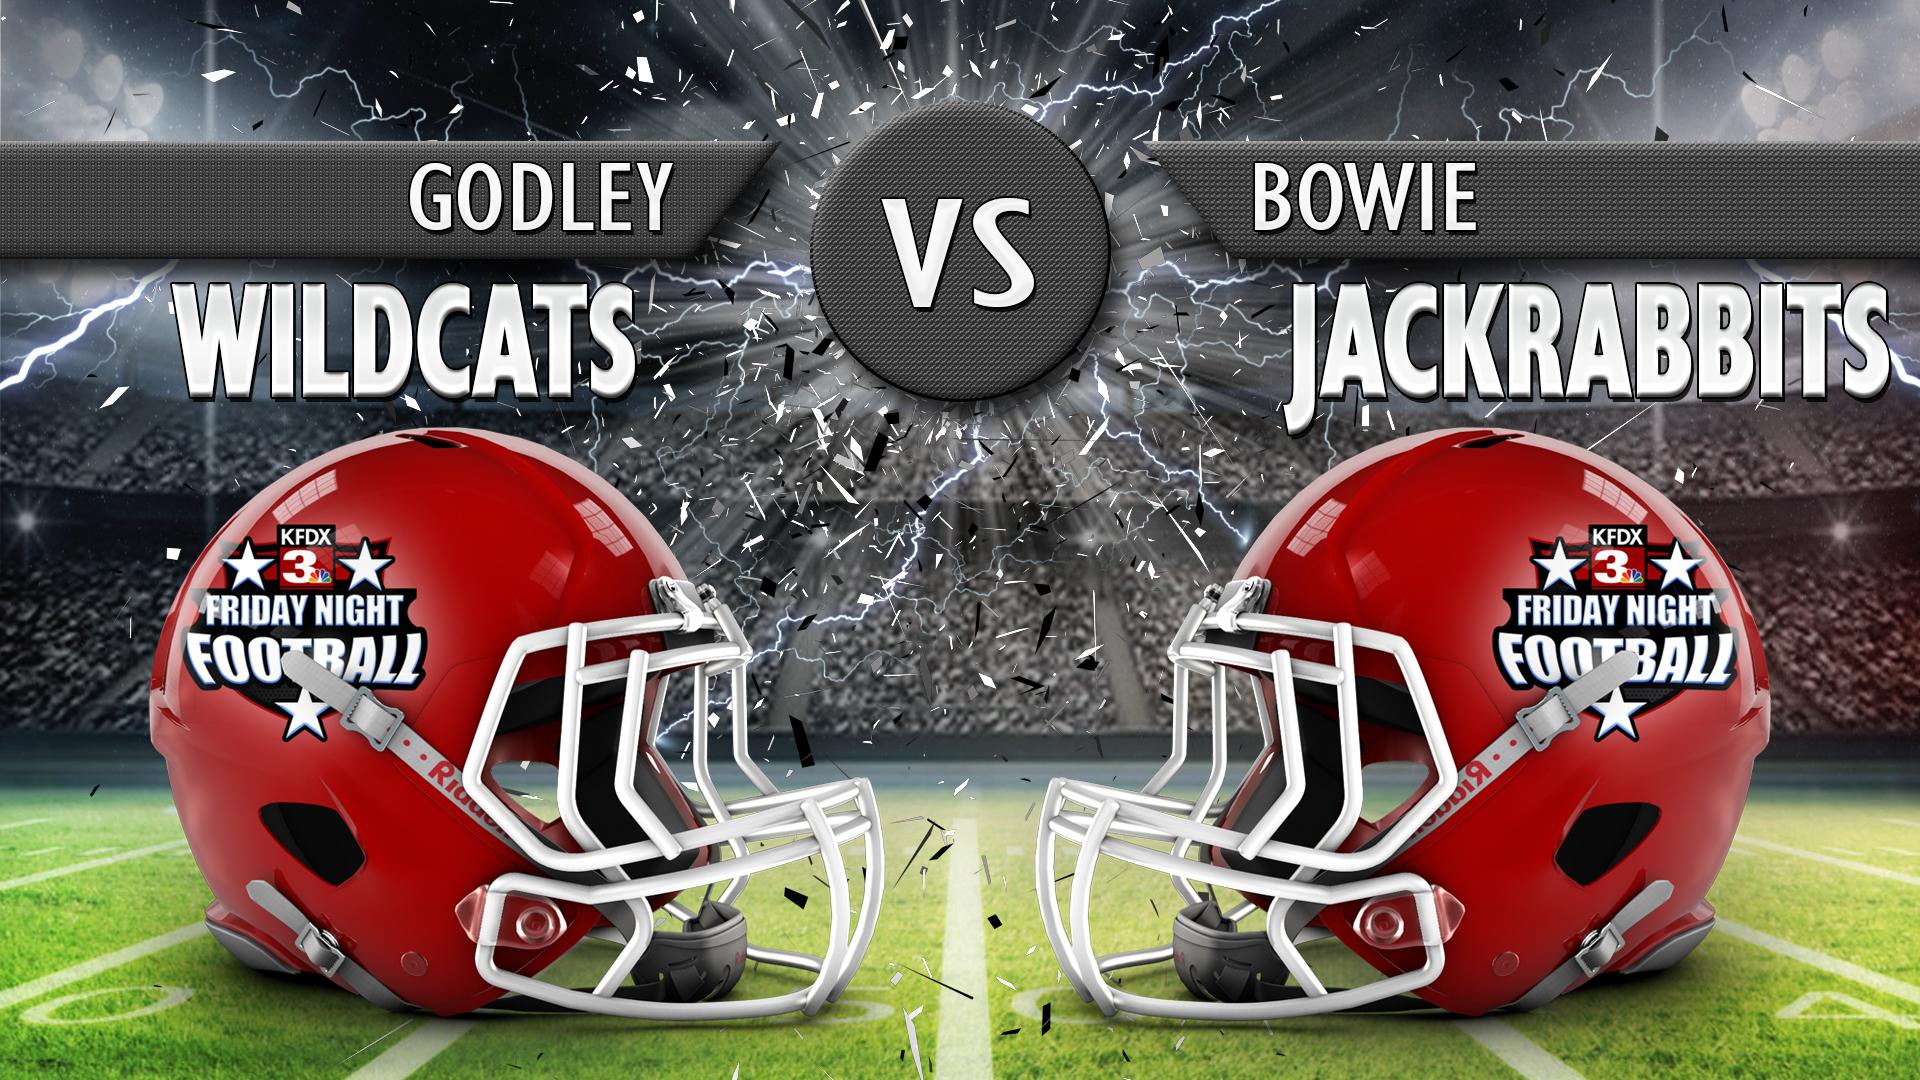 GODLEY VS BOWIE_1535739199541.jpg.jpg